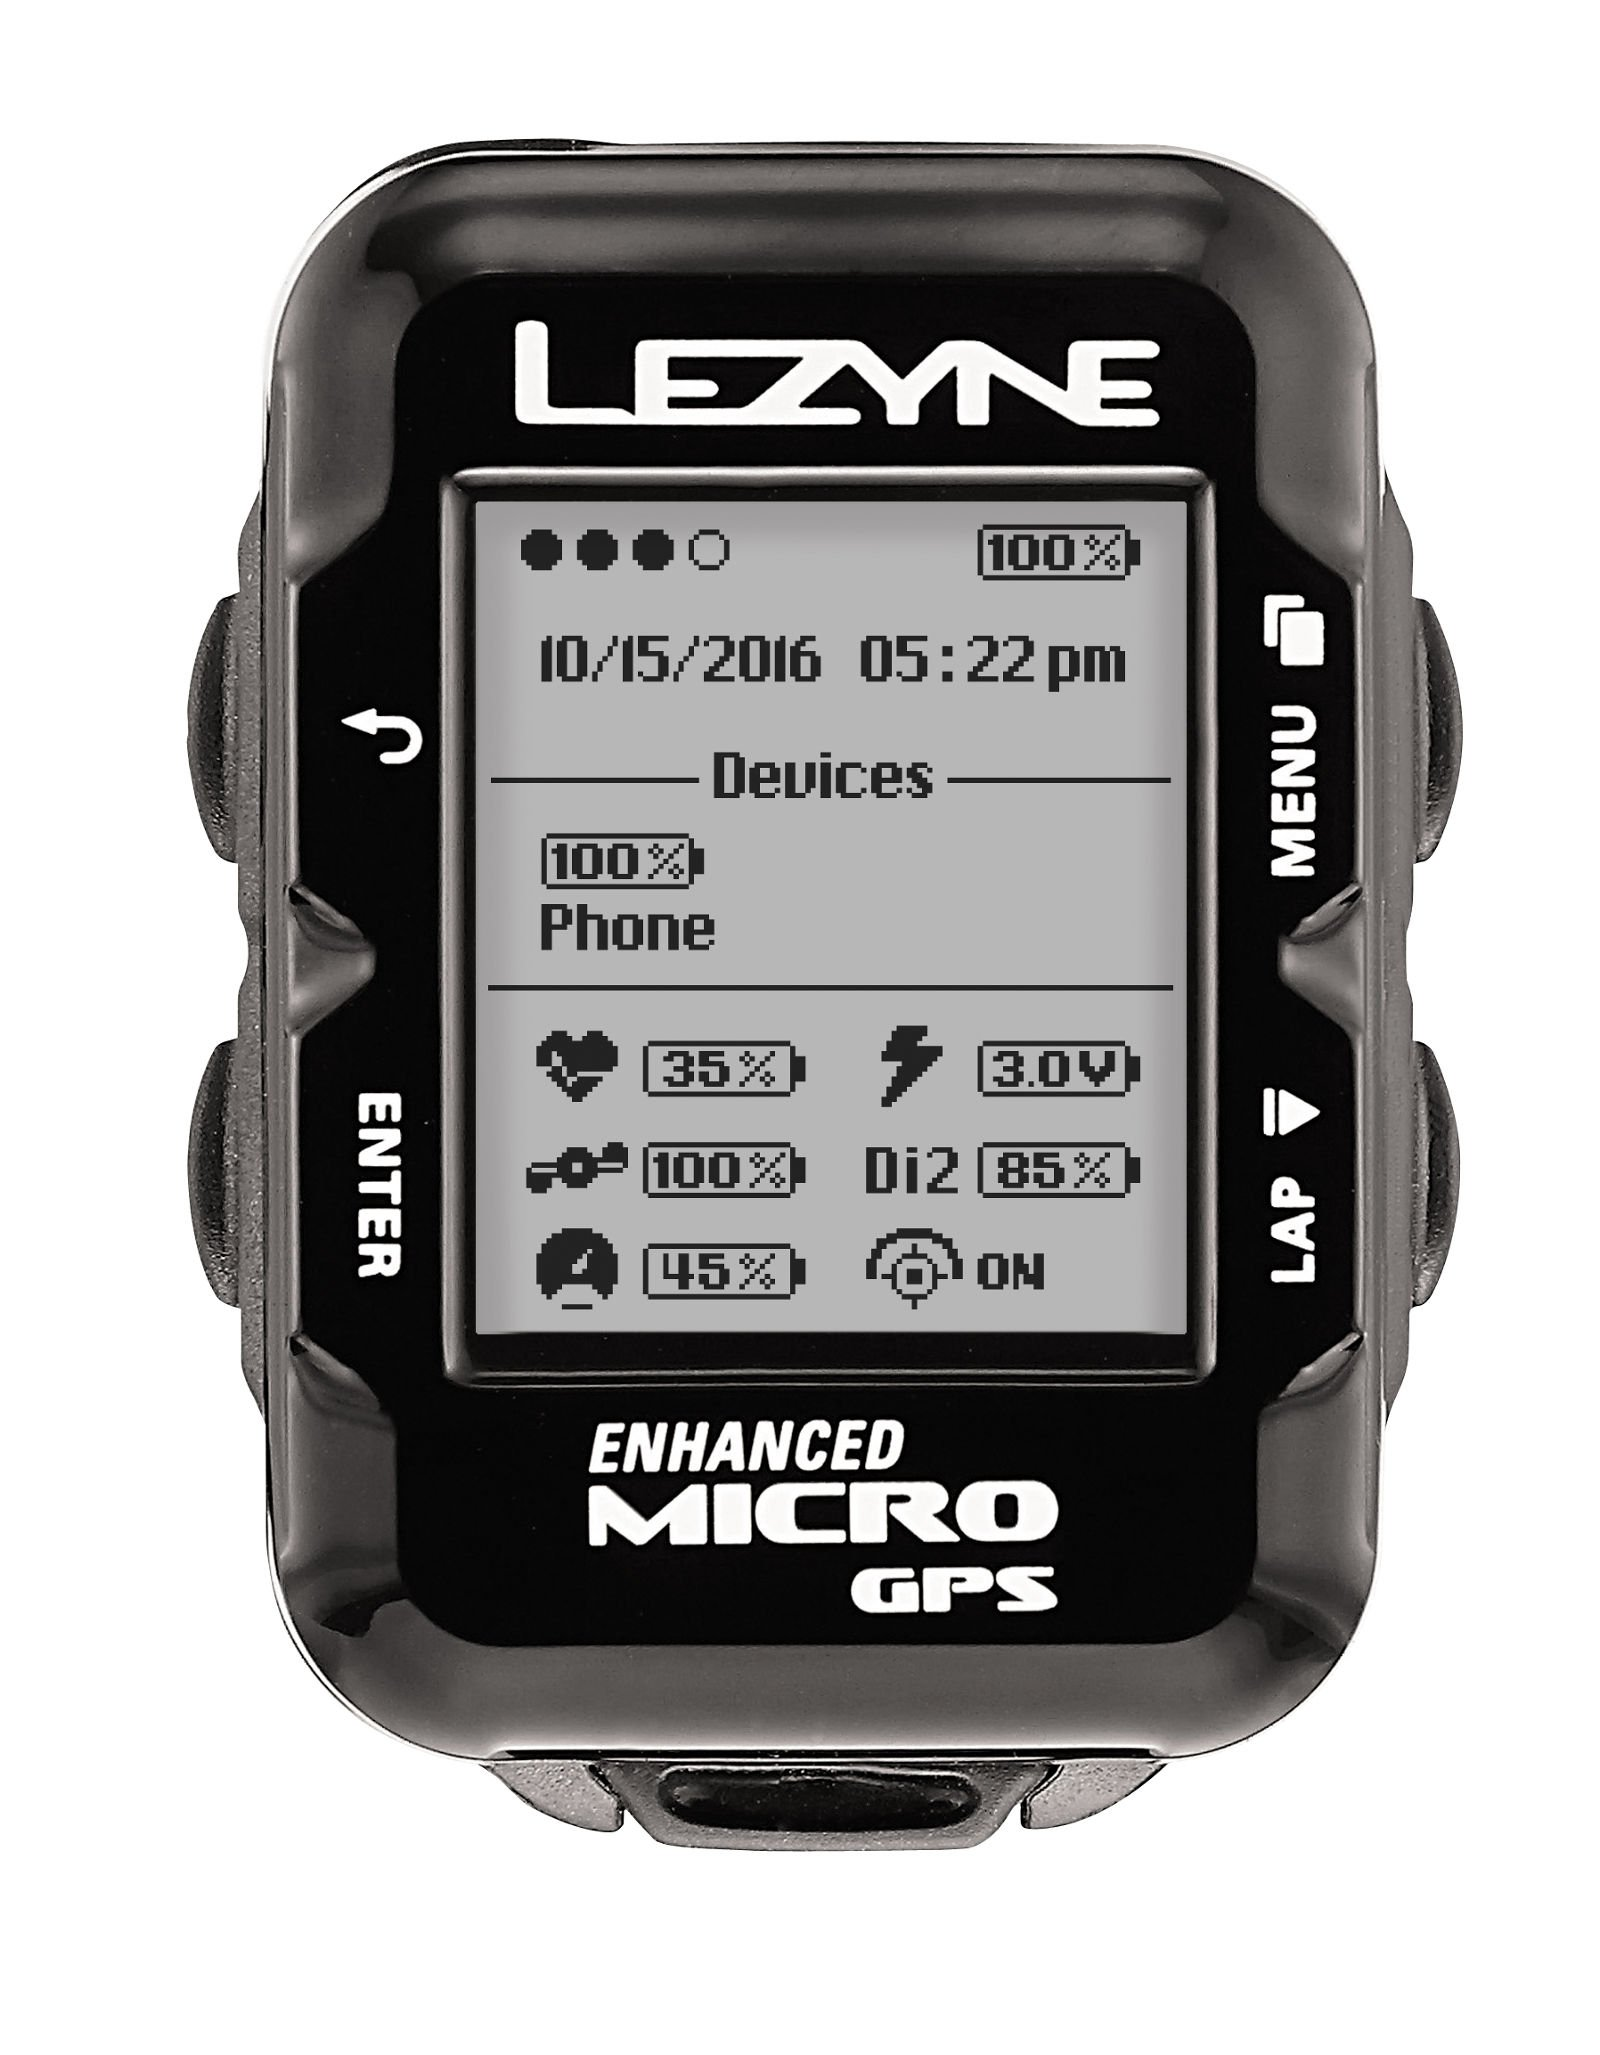 Lezyne Micro GPS, Black, One Size by Lezyne (Image #2)